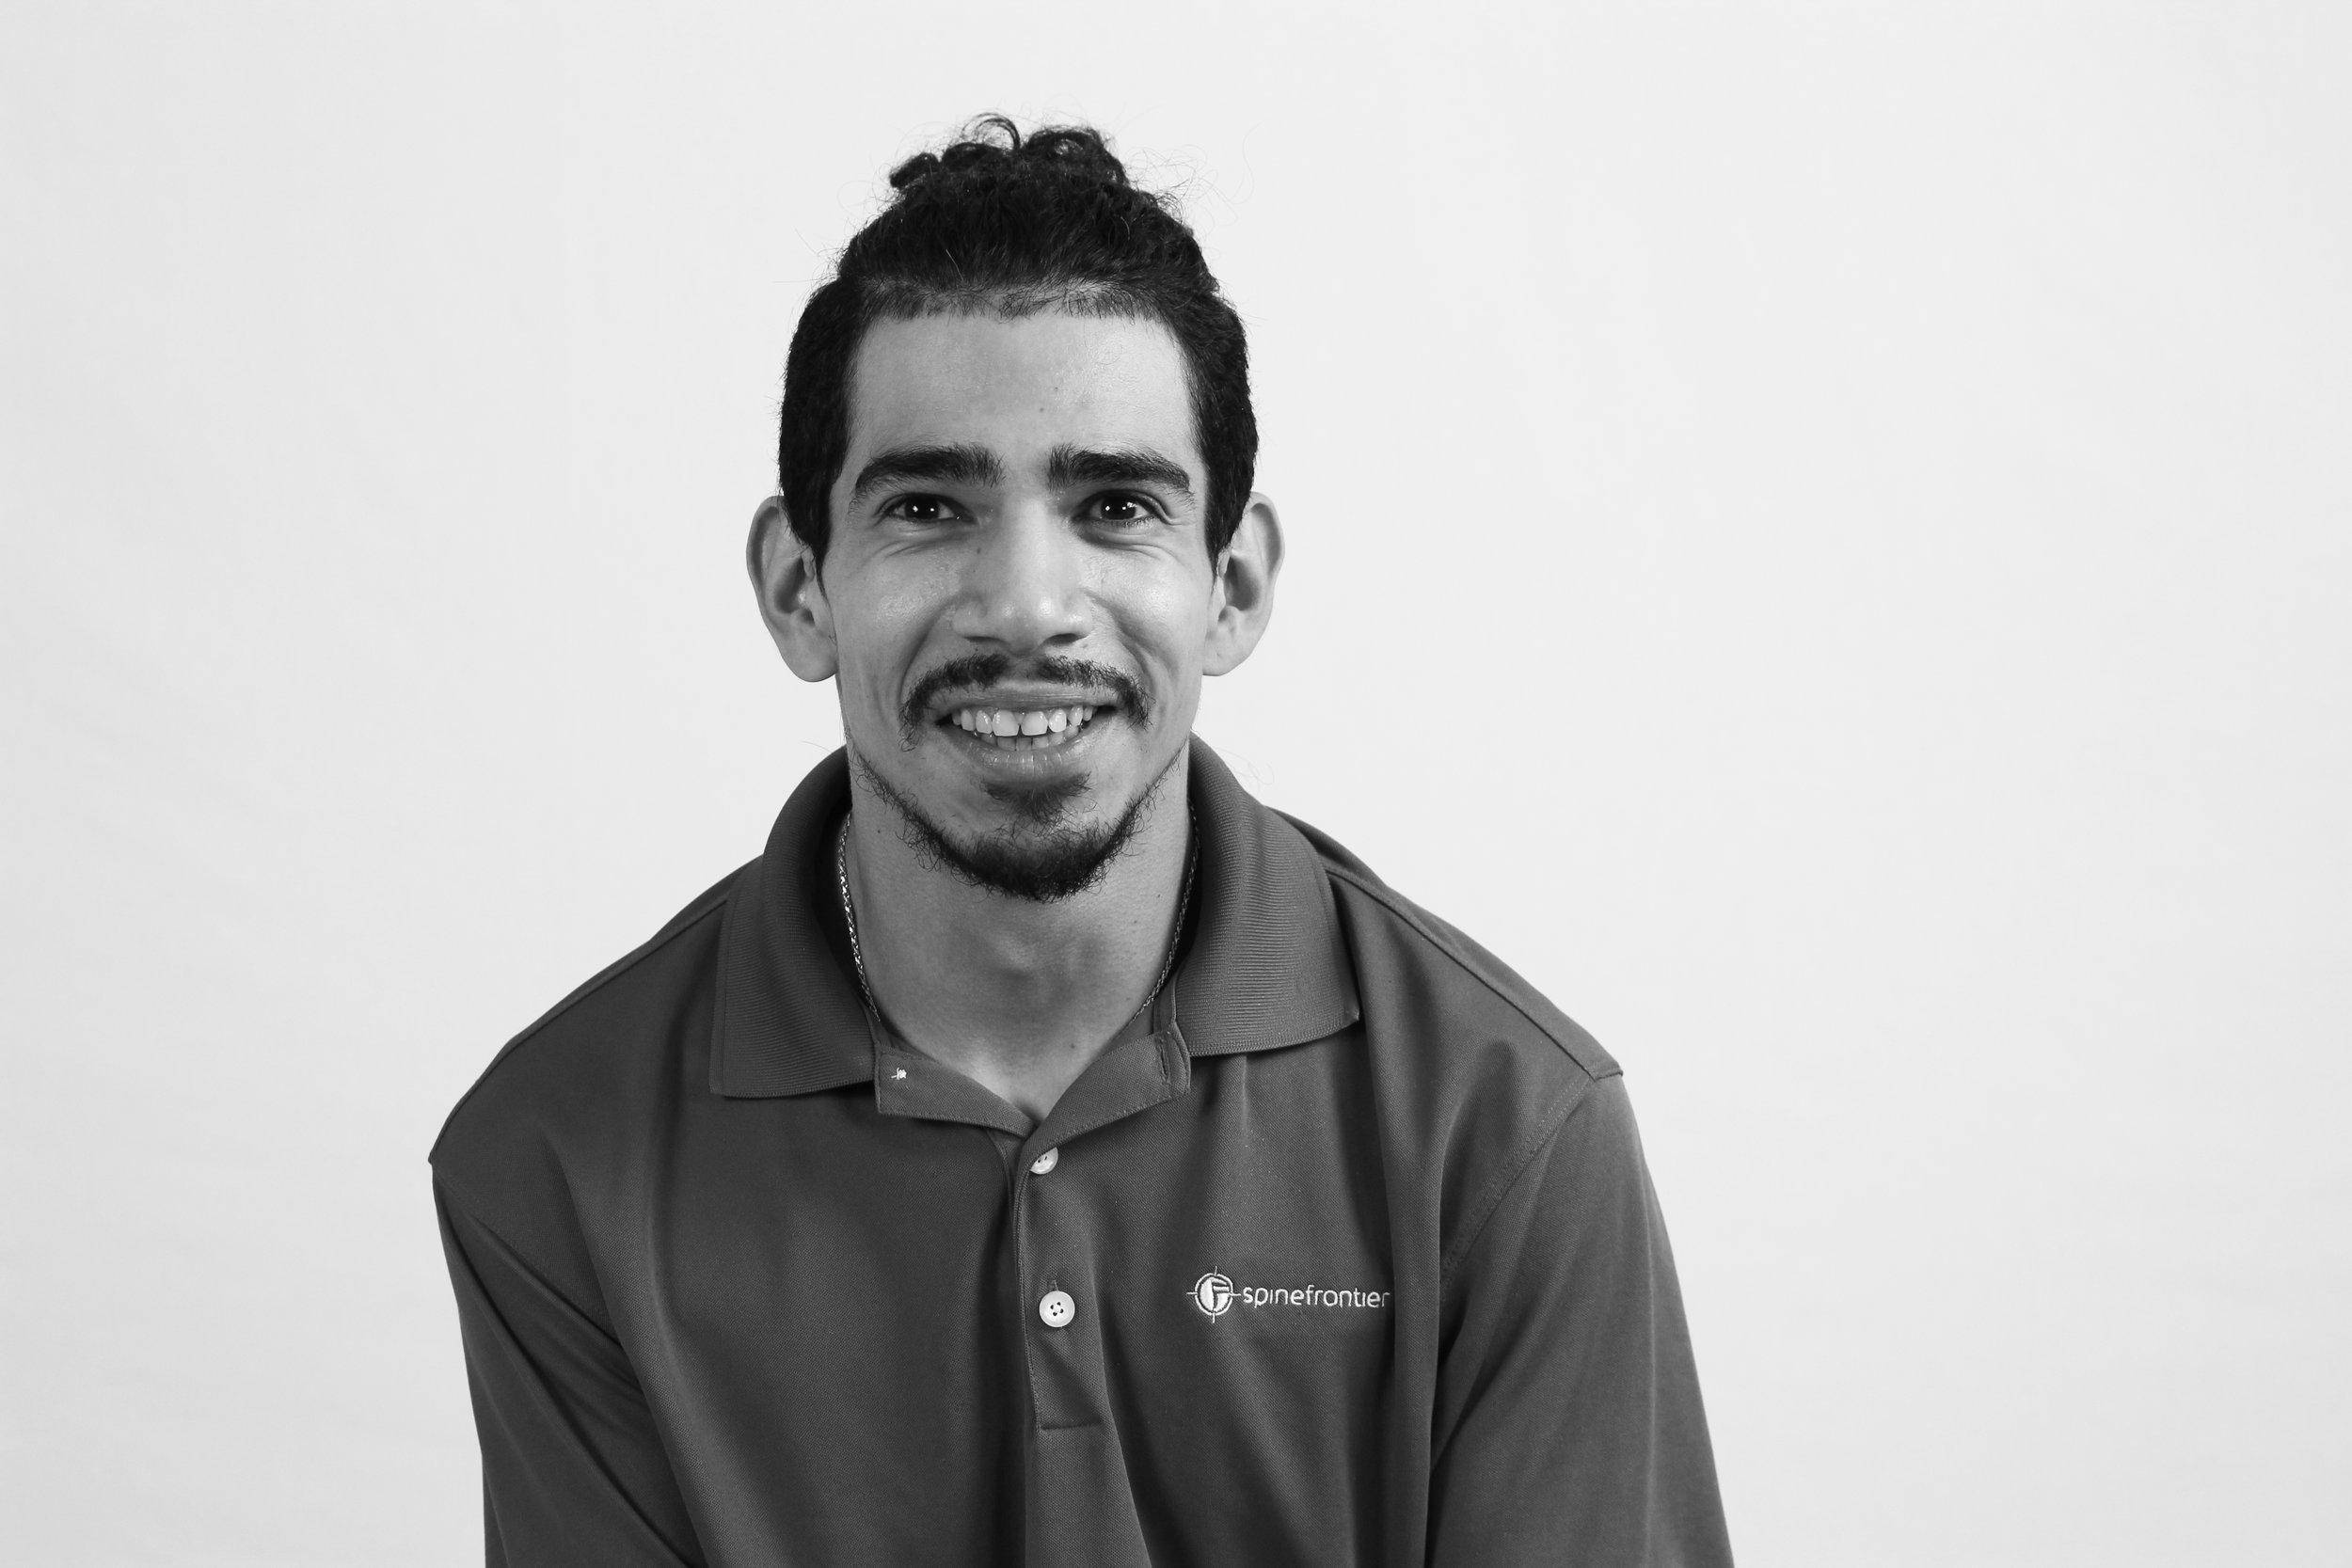 Oscar Herrera  Product Manager/Senior Mechanical Engineer  OscarHerrera@SpineFrontier.com